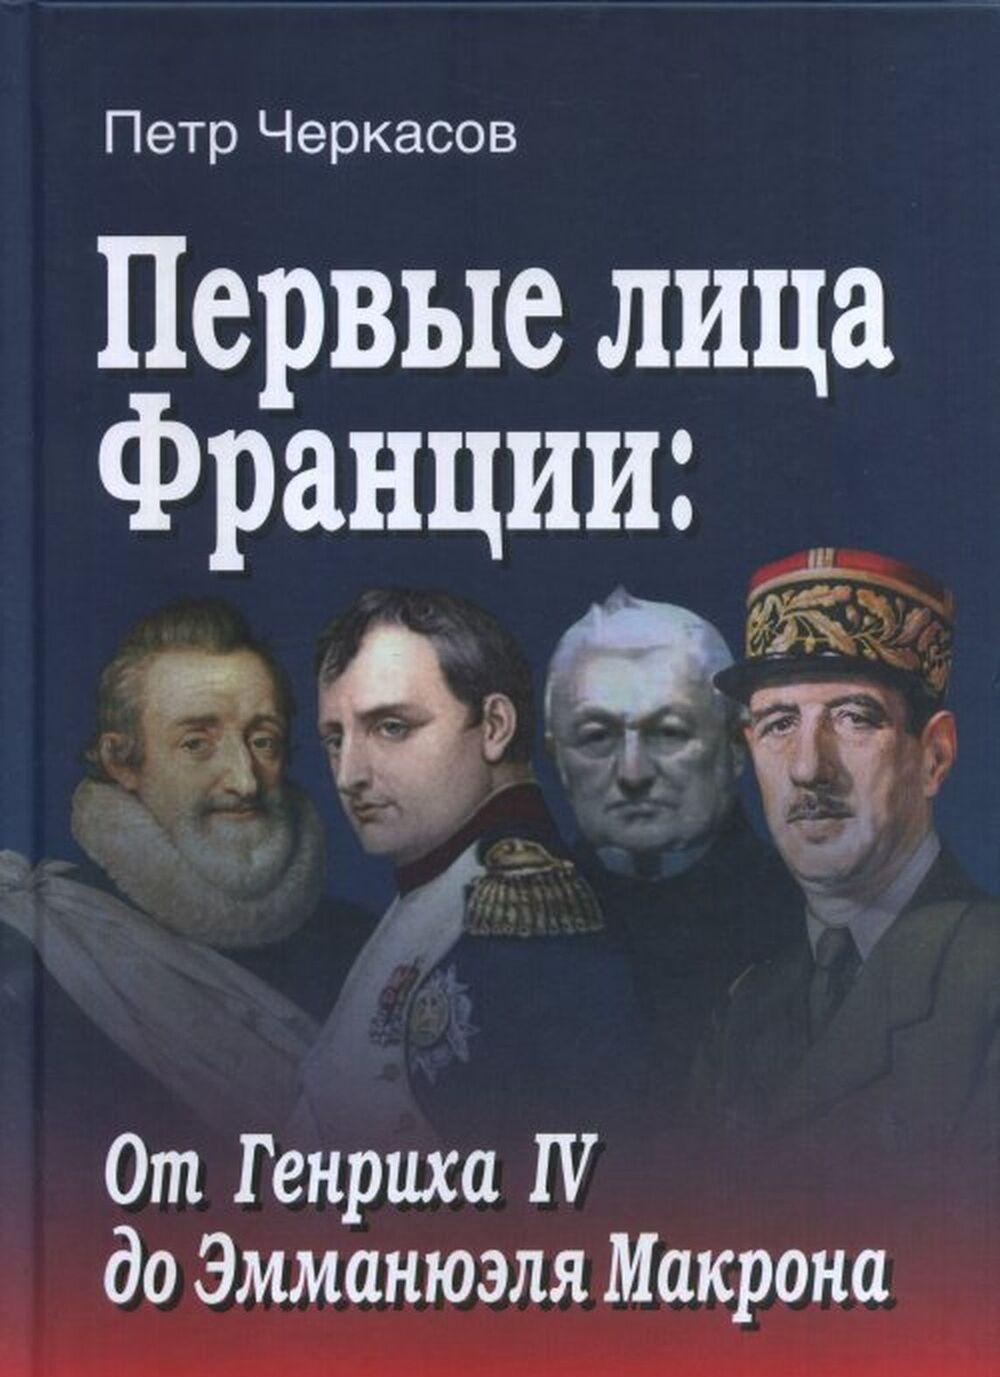 Pervye litsa Frantsii. ot Genrikha IV do Emmanjuelja Makrona